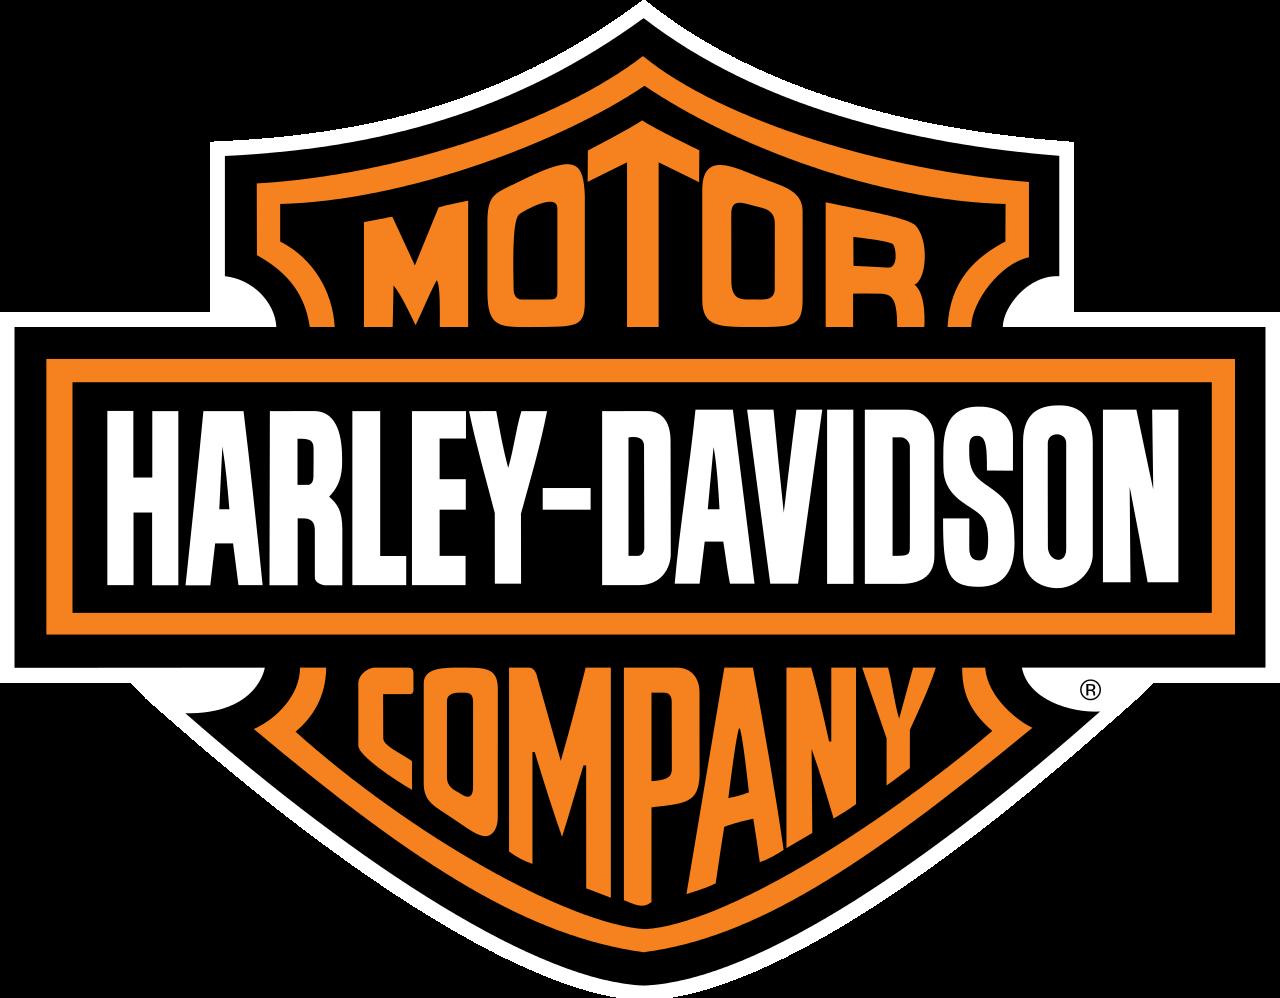 harley davidson parking only blechschild 20x30 cm bestellen. Black Bedroom Furniture Sets. Home Design Ideas